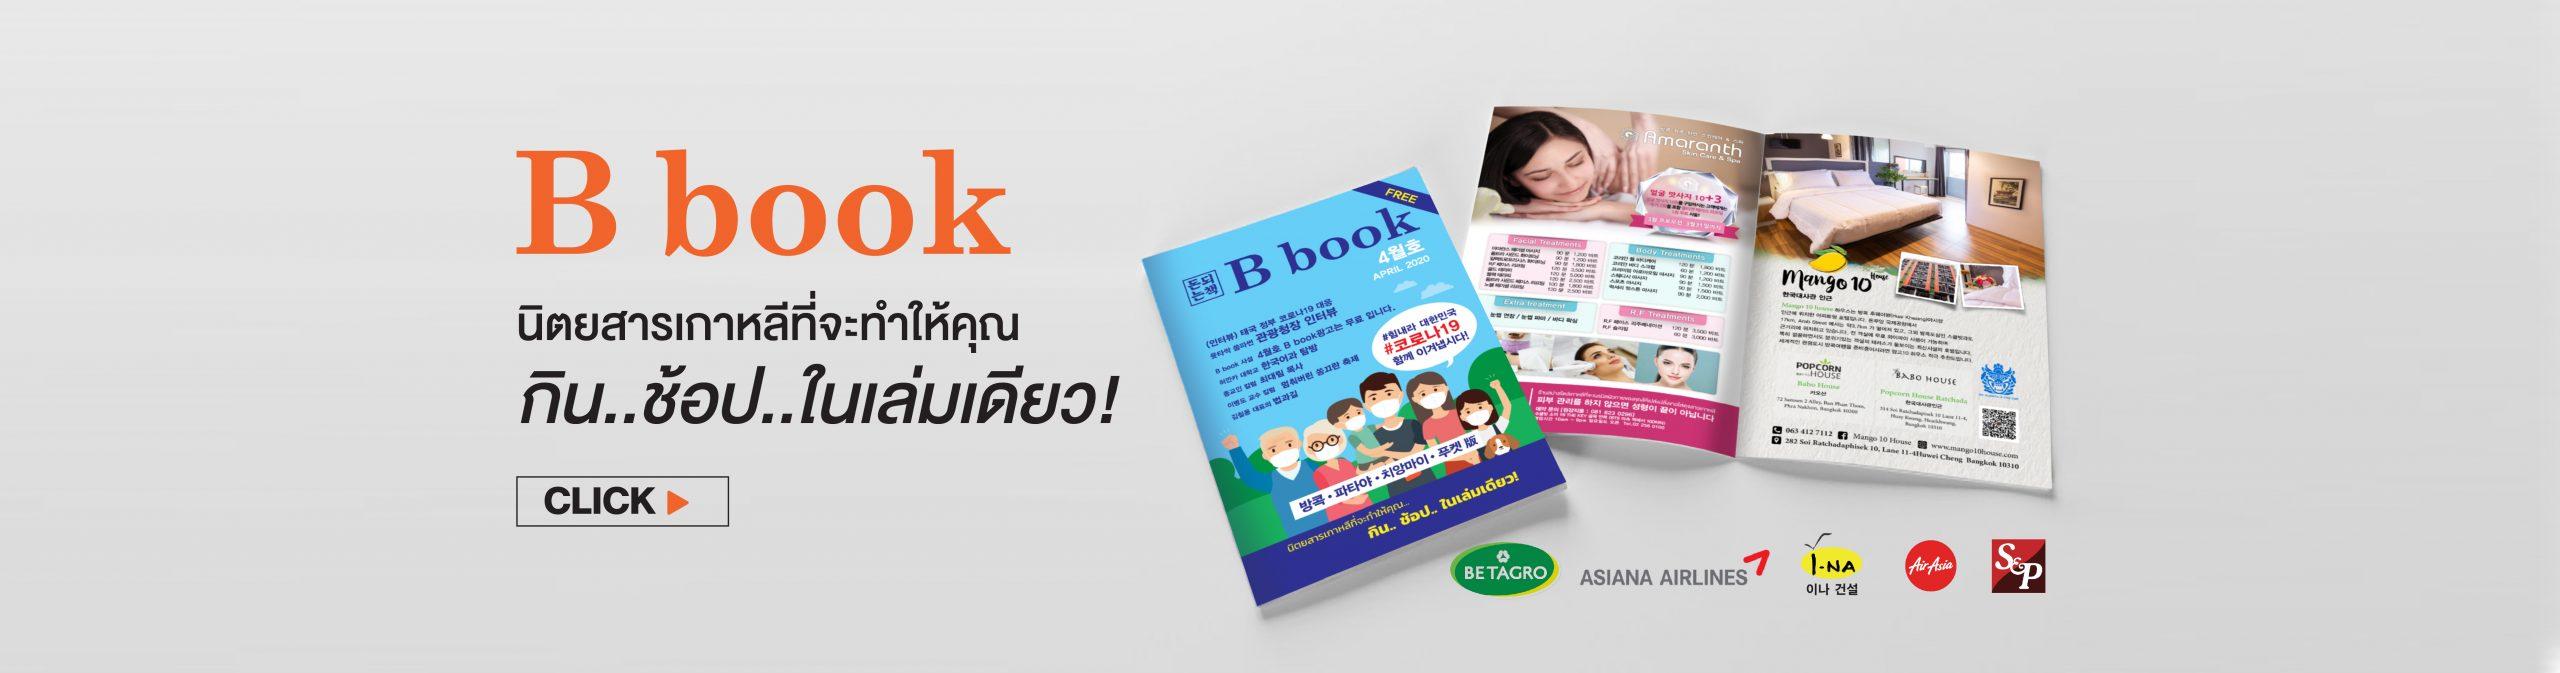 bbook-01